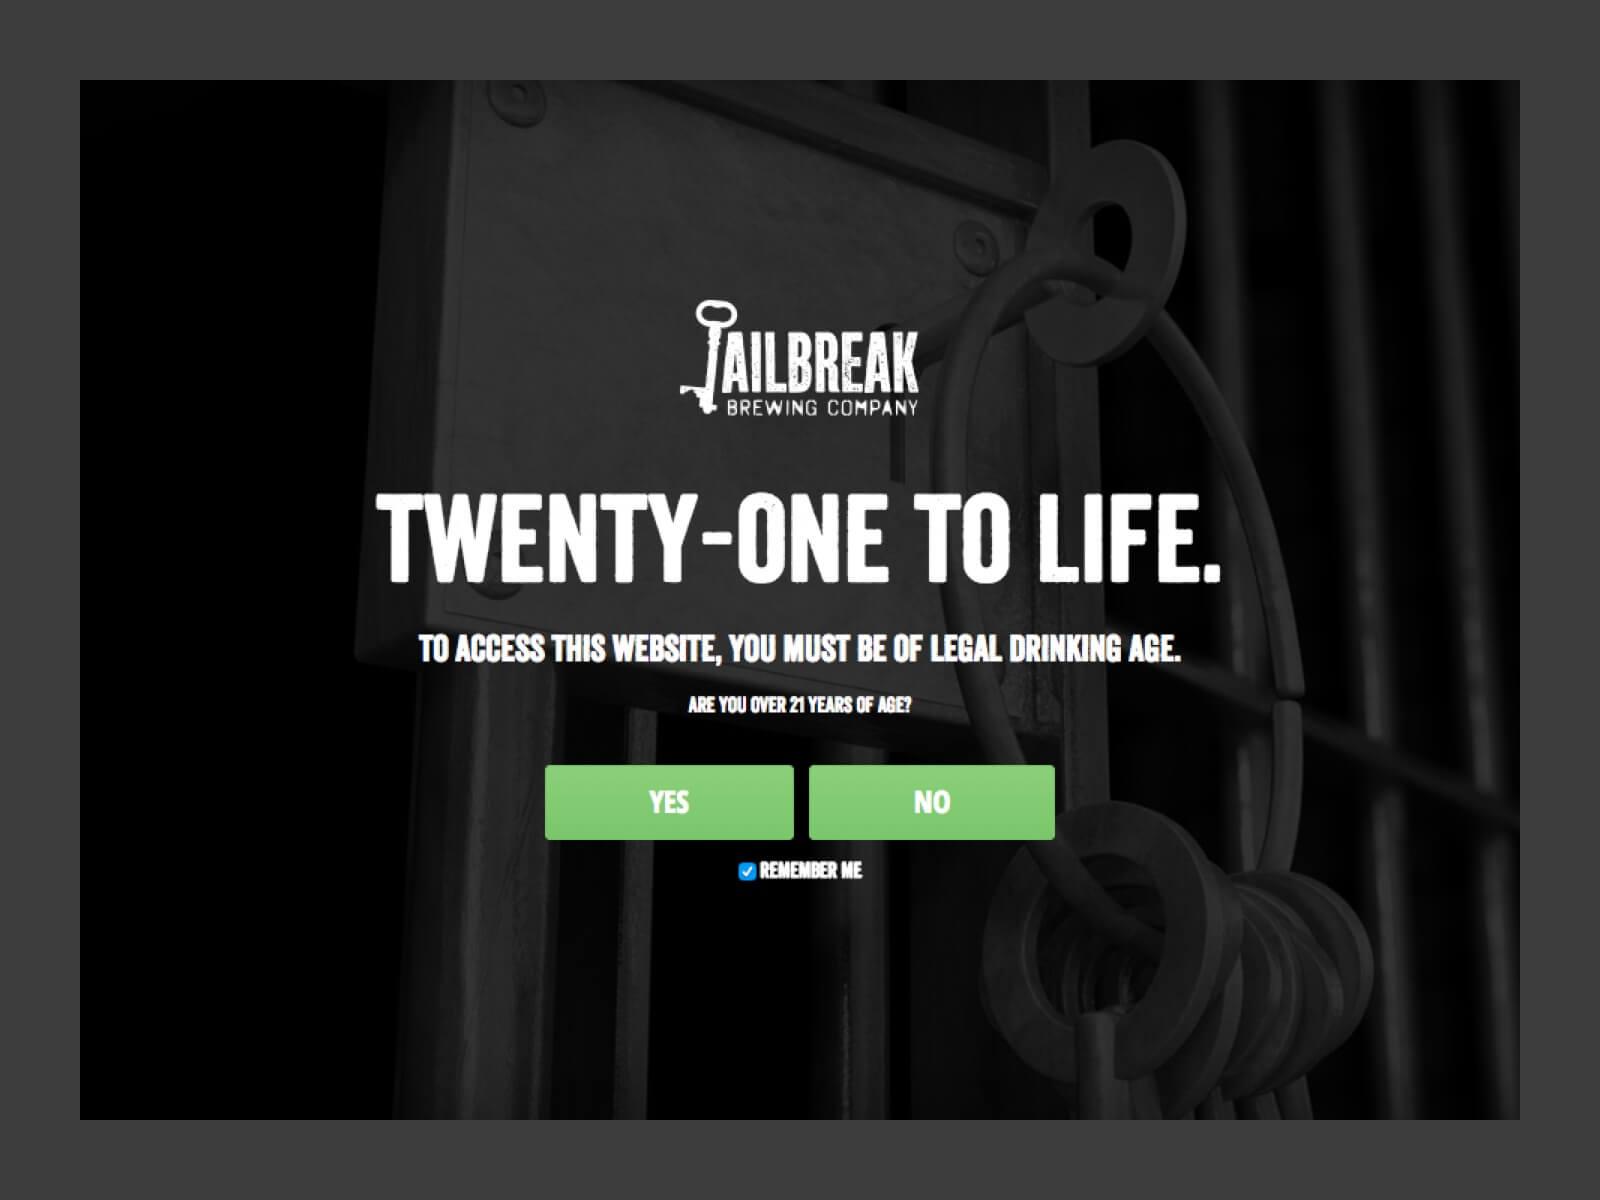 jailbreak-age-gate@2x